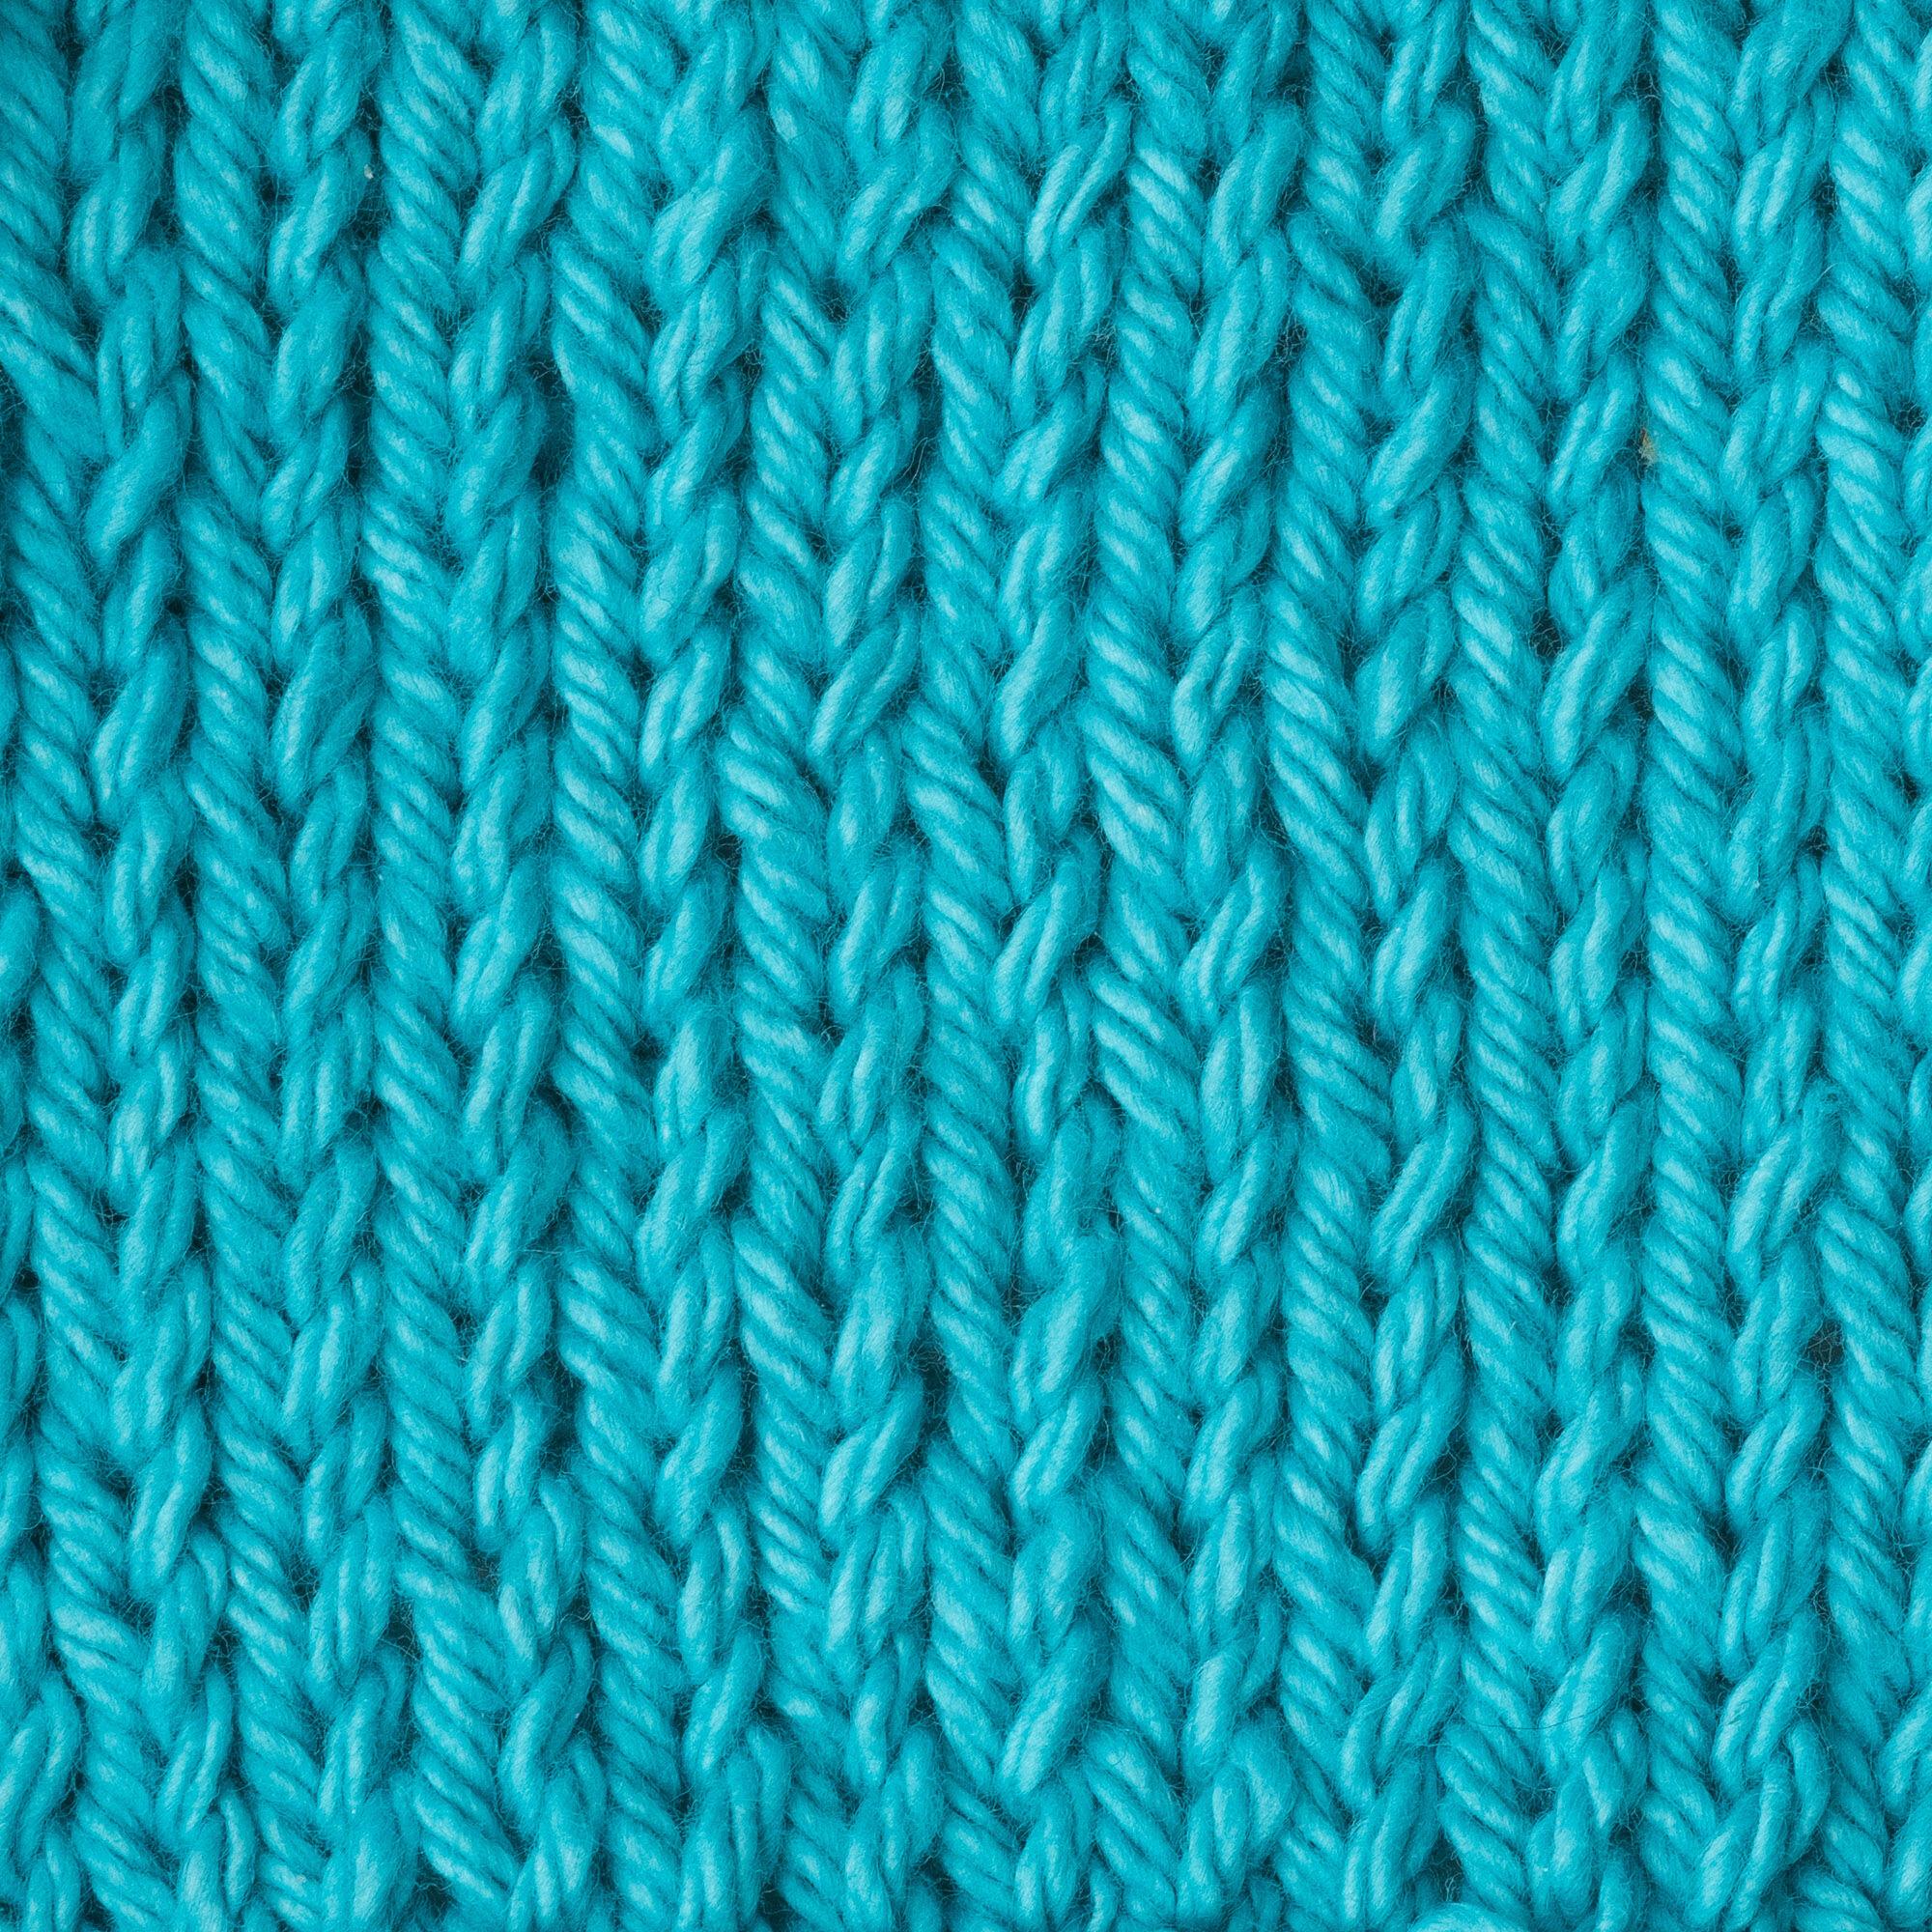 ... Bernat Handicrafter Cotton Yarn   40 50g 1.5 ... ca8cf77df